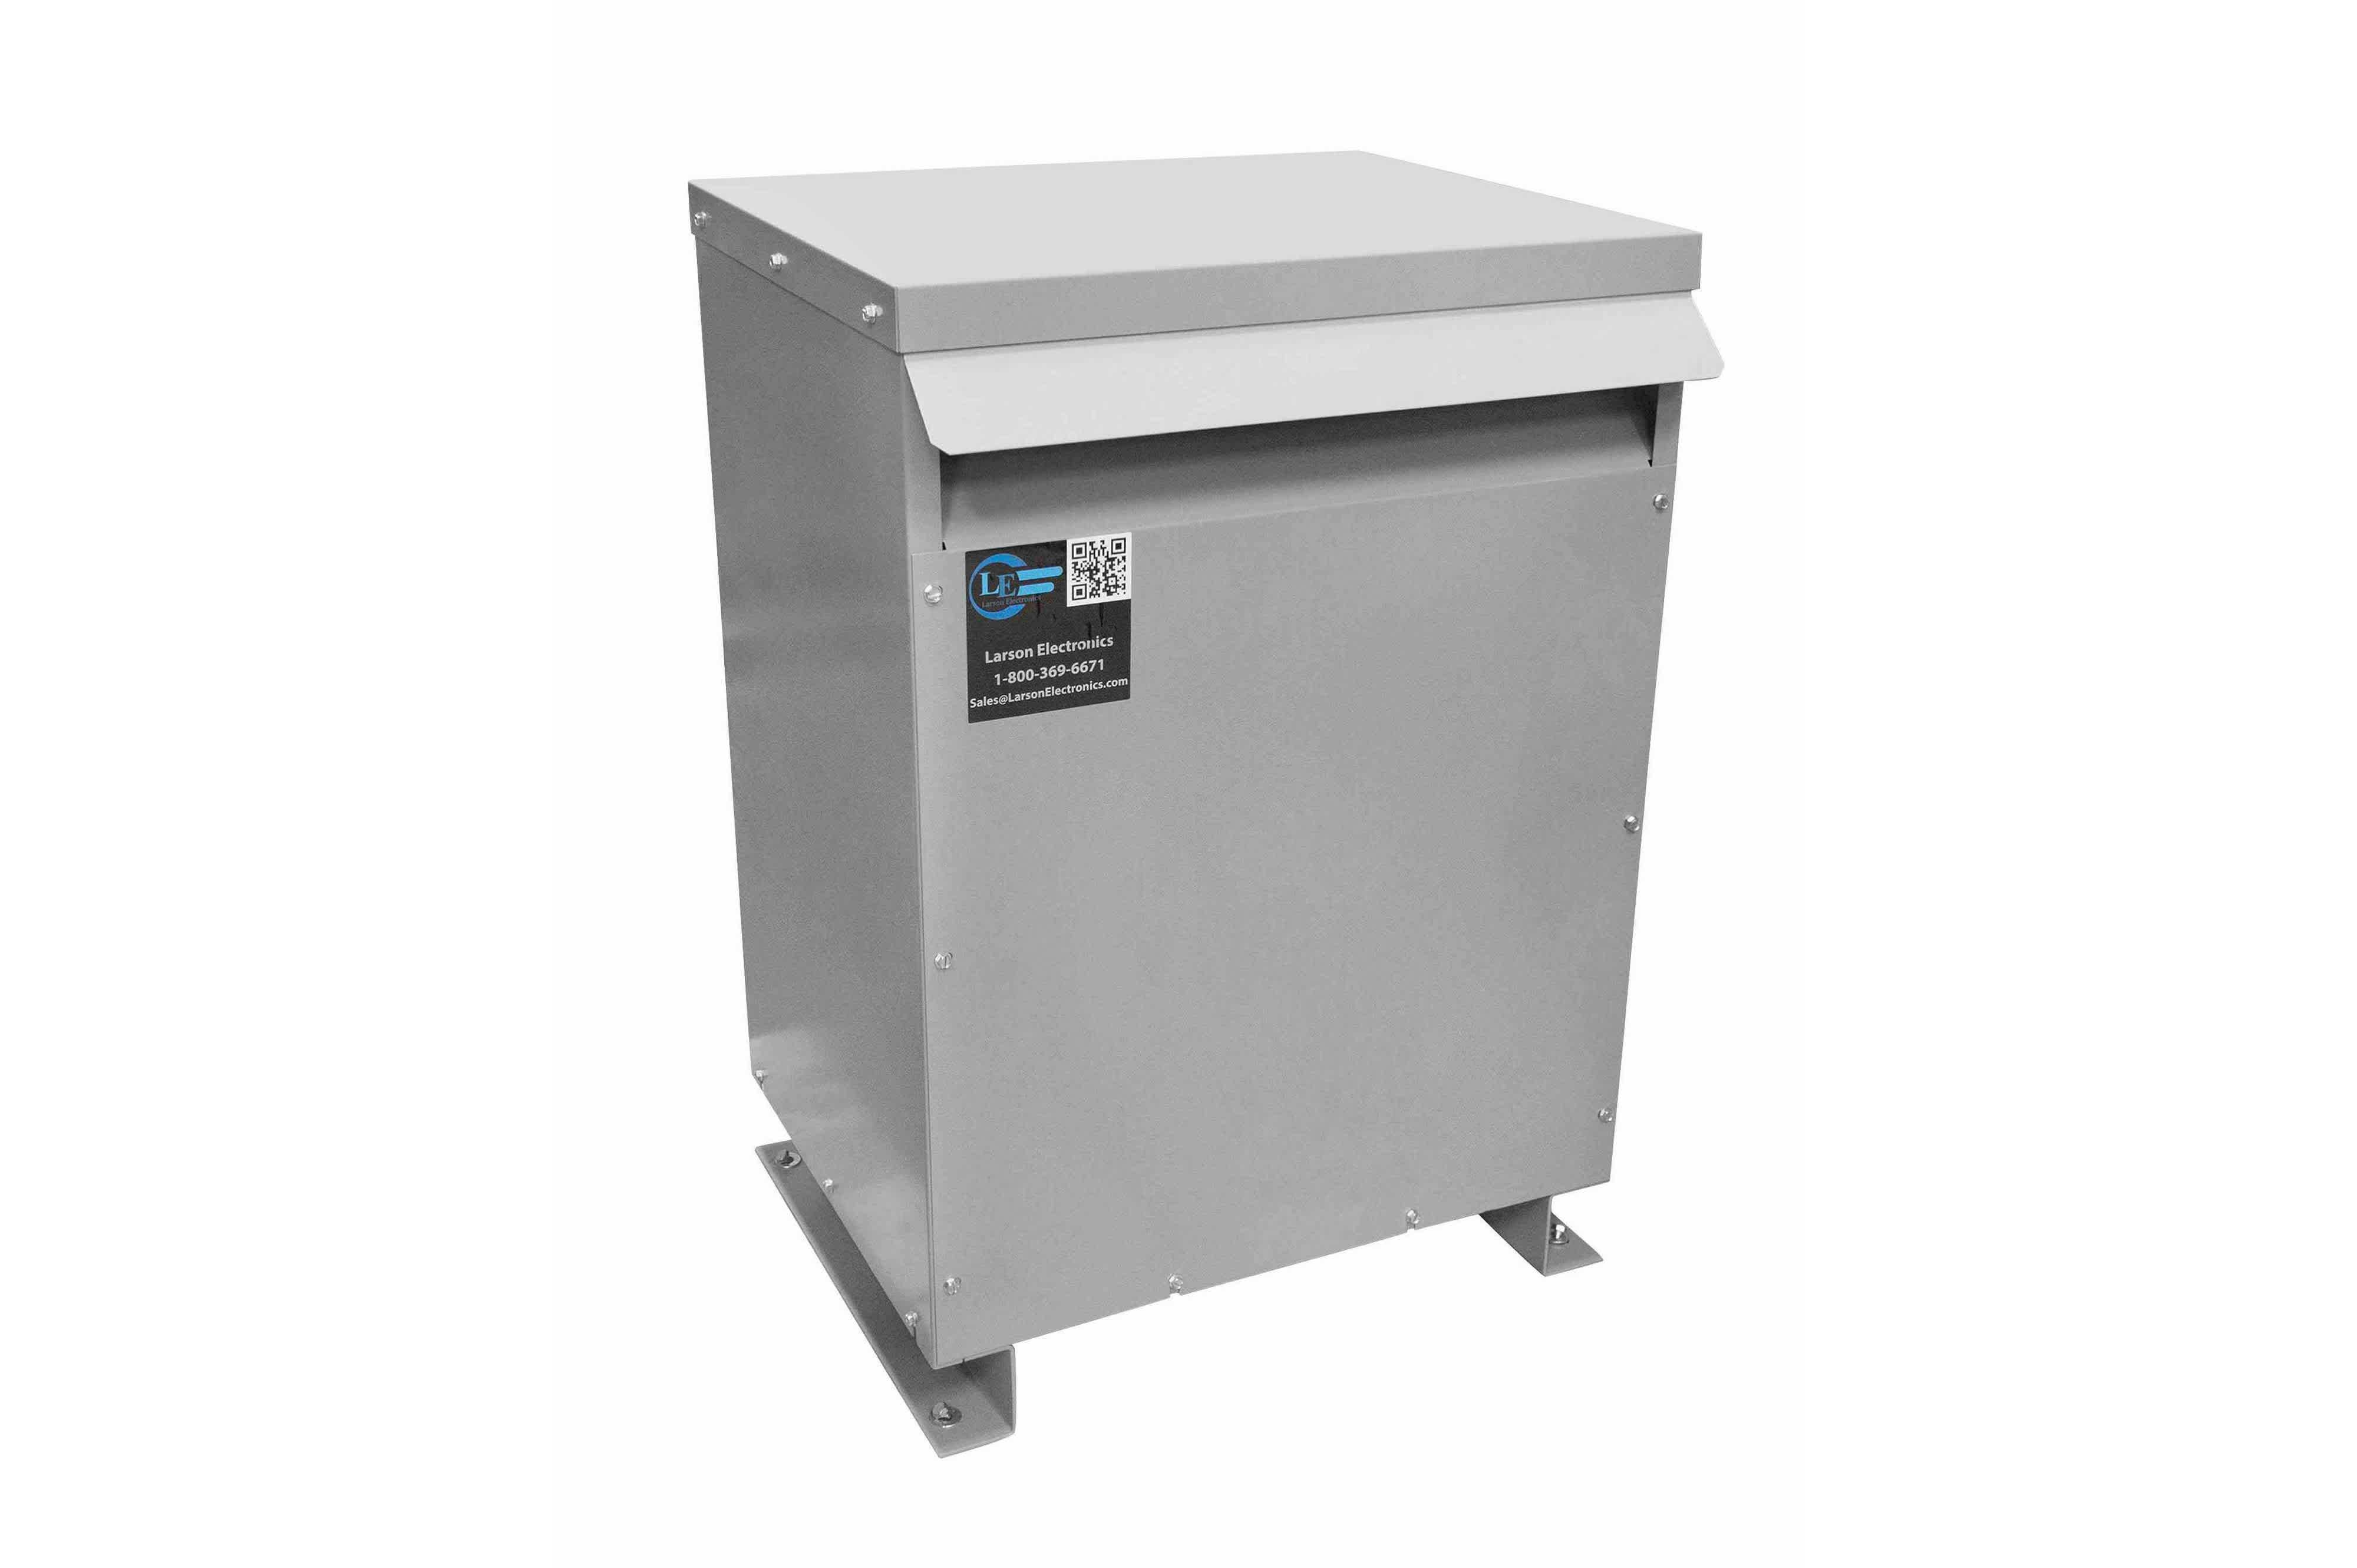 20 kVA 3PH Isolation Transformer, 230V Wye Primary, 480V Delta Secondary, N3R, Ventilated, 60 Hz